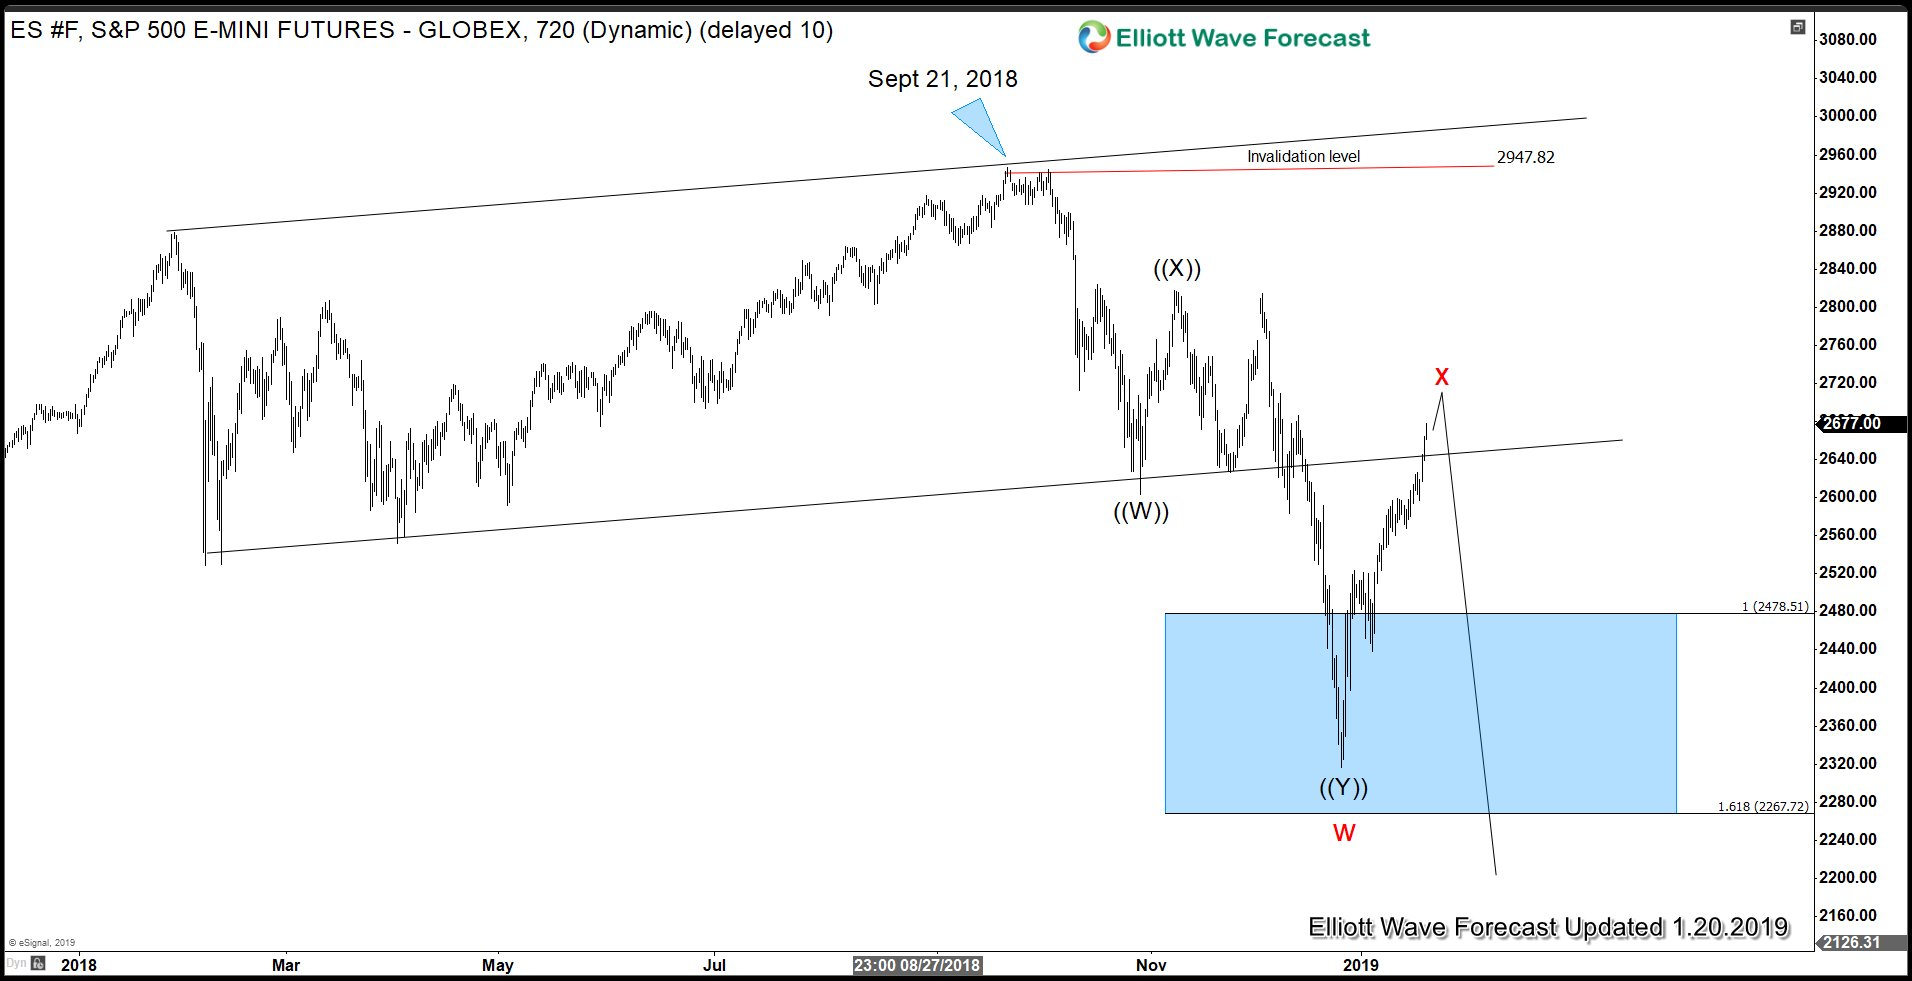 S&P 500 E-Mini Futures Elliott Wave chart should slow down the rally